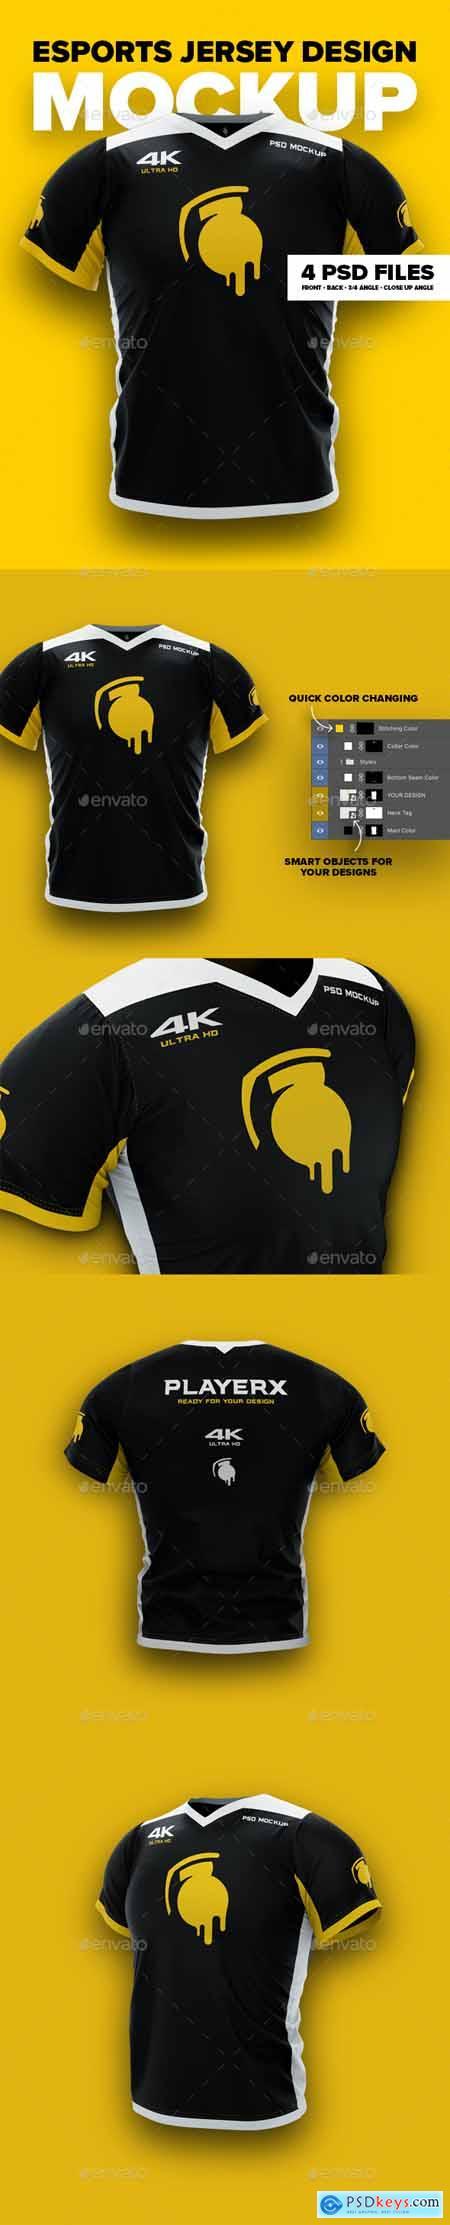 4K Esports Jersey Design Mockup 24682108